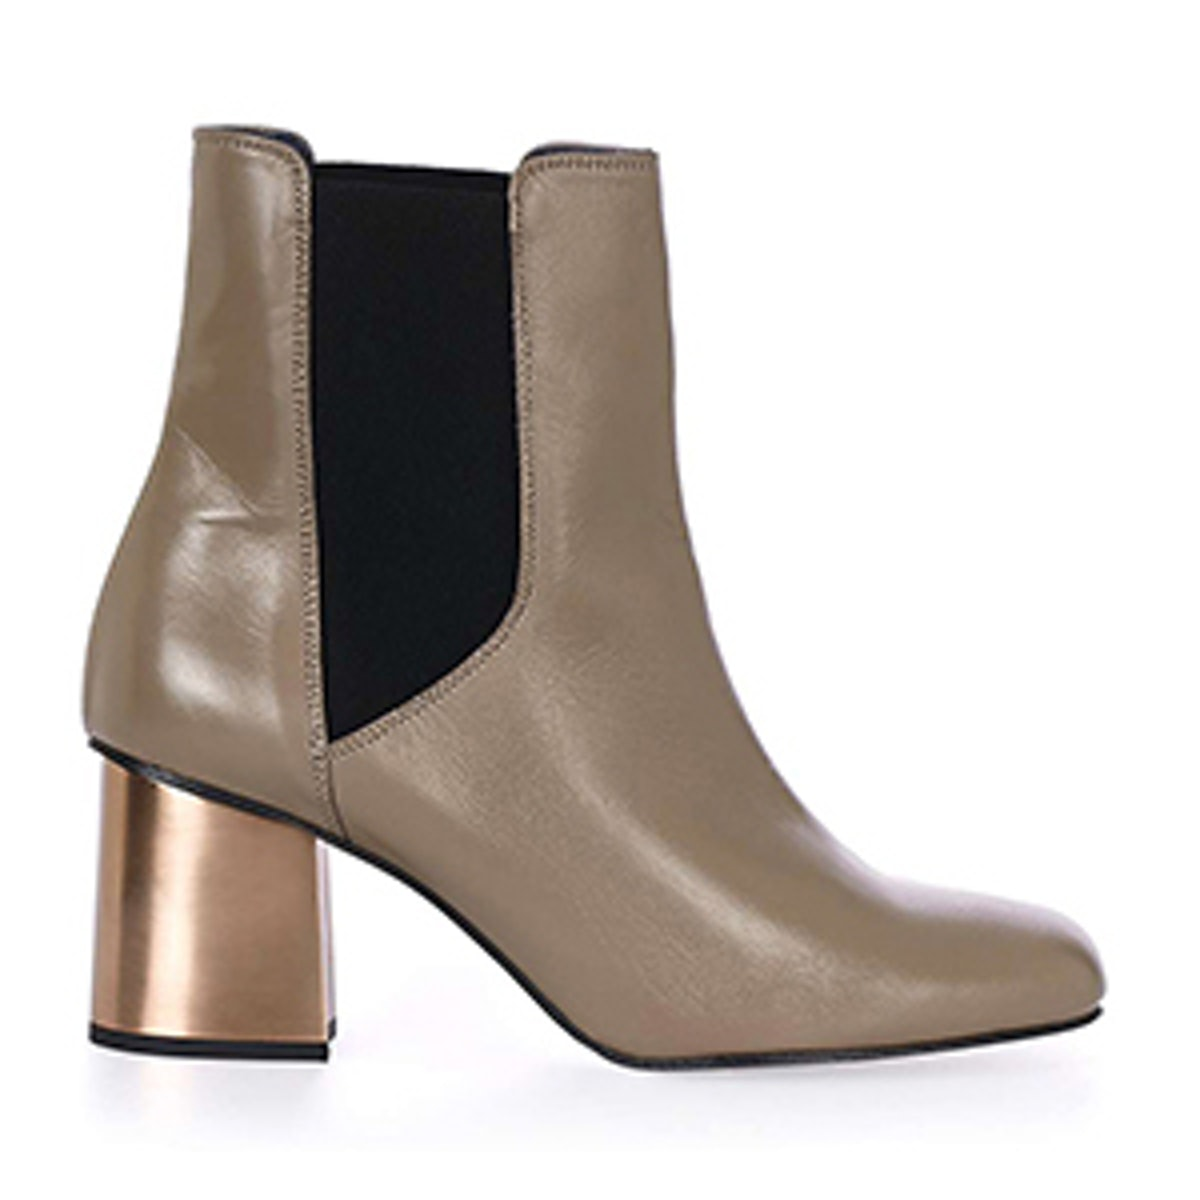 Mayfair Chrome Heel Boots